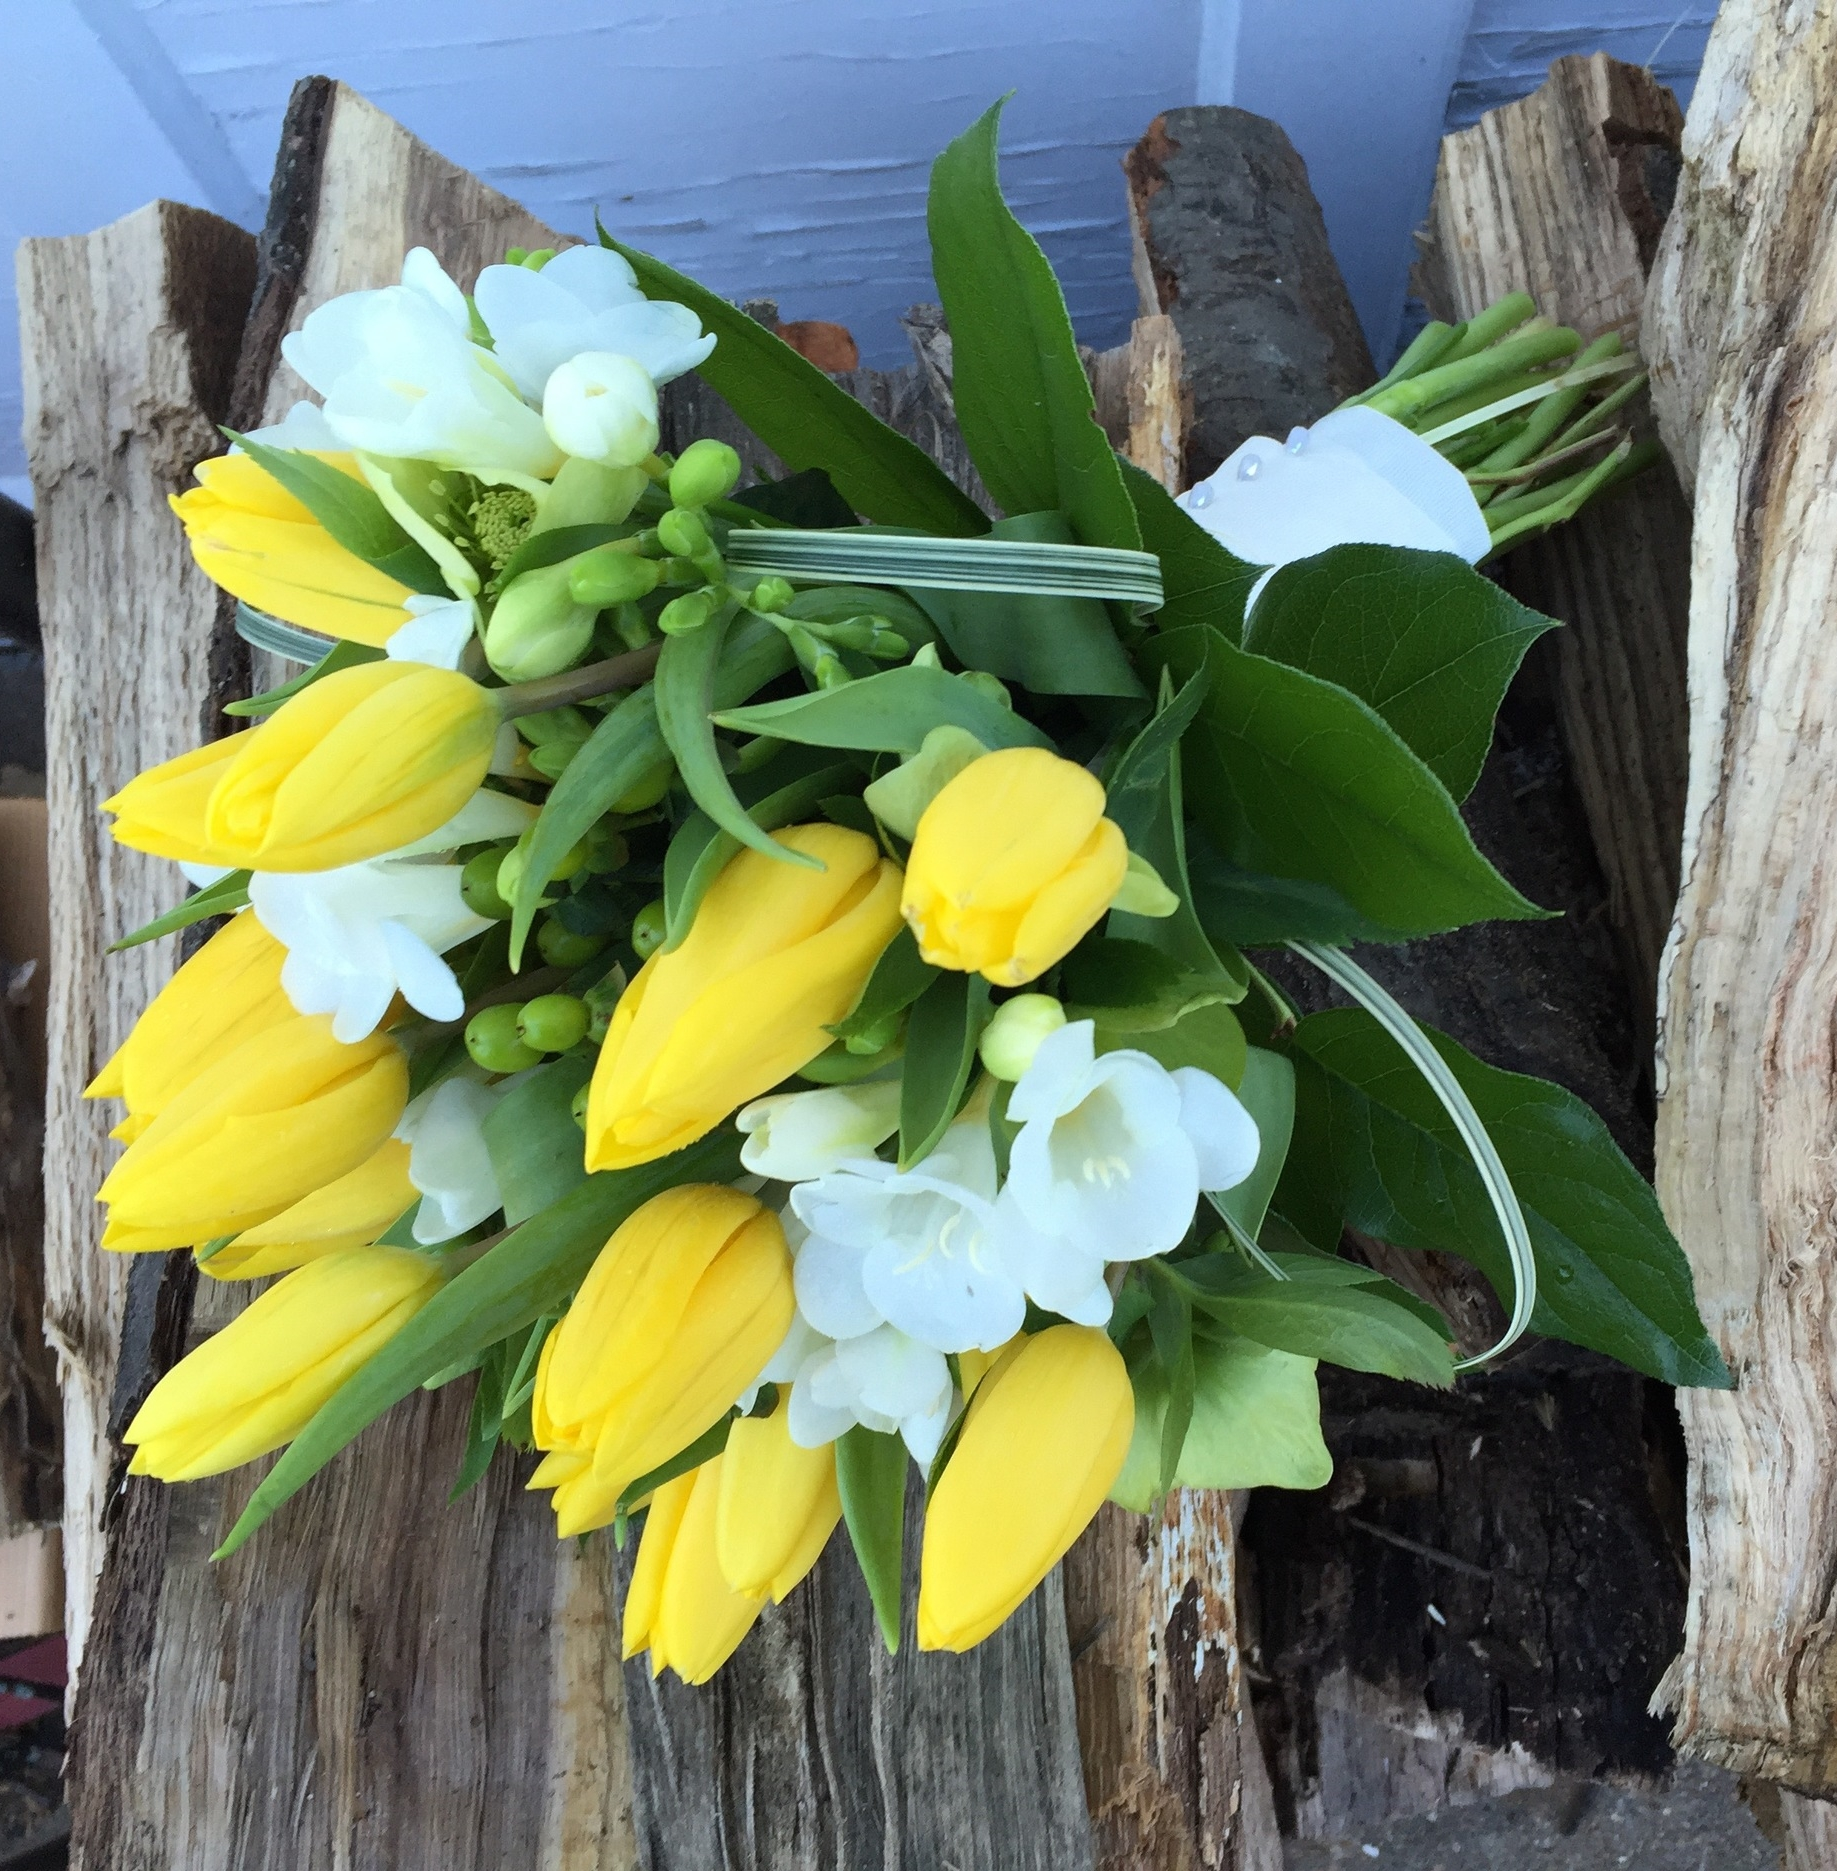 Yellow tulips and white freesia